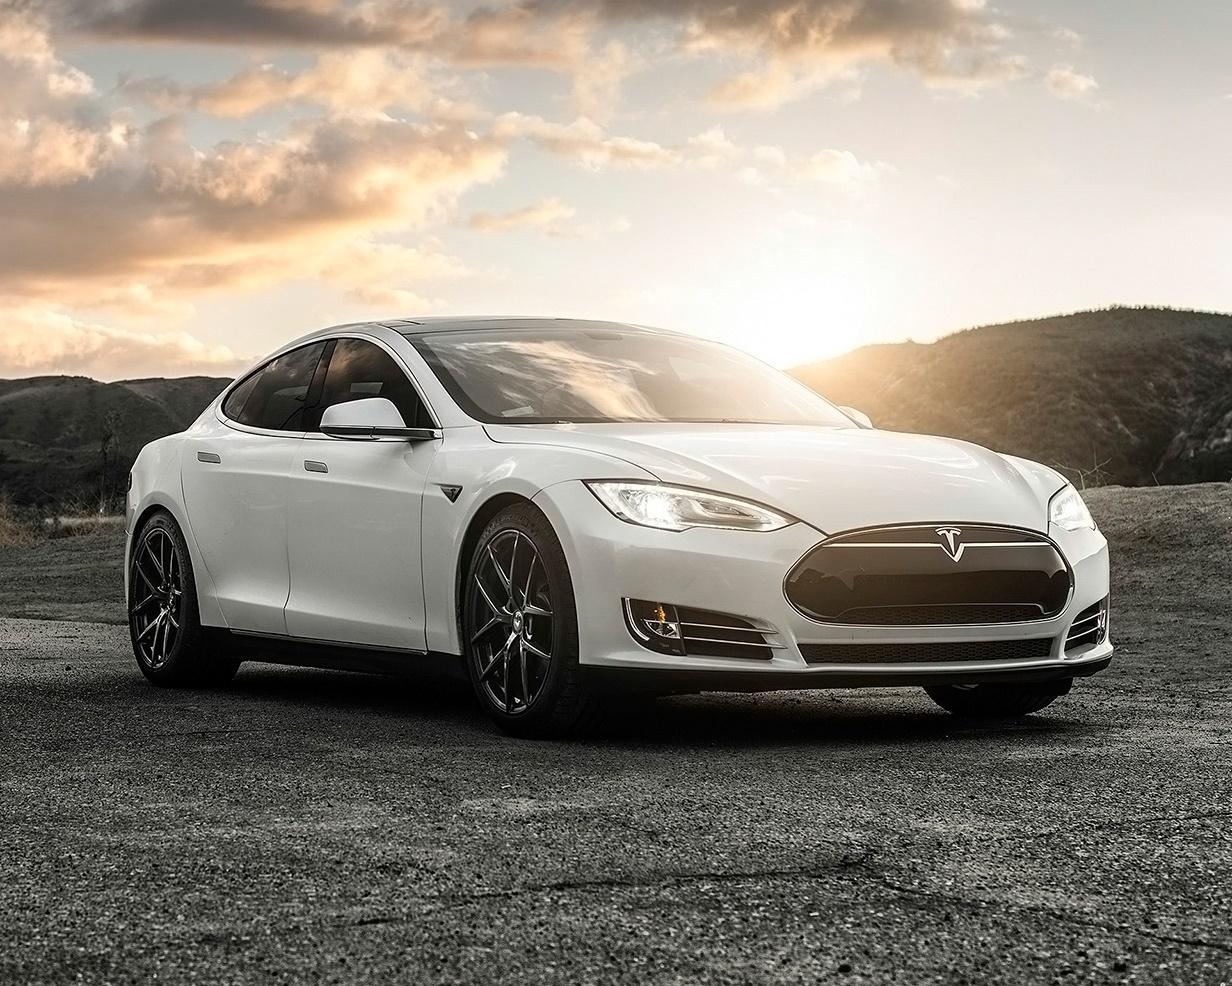 гарантия на батарею автомобиля tesla model s